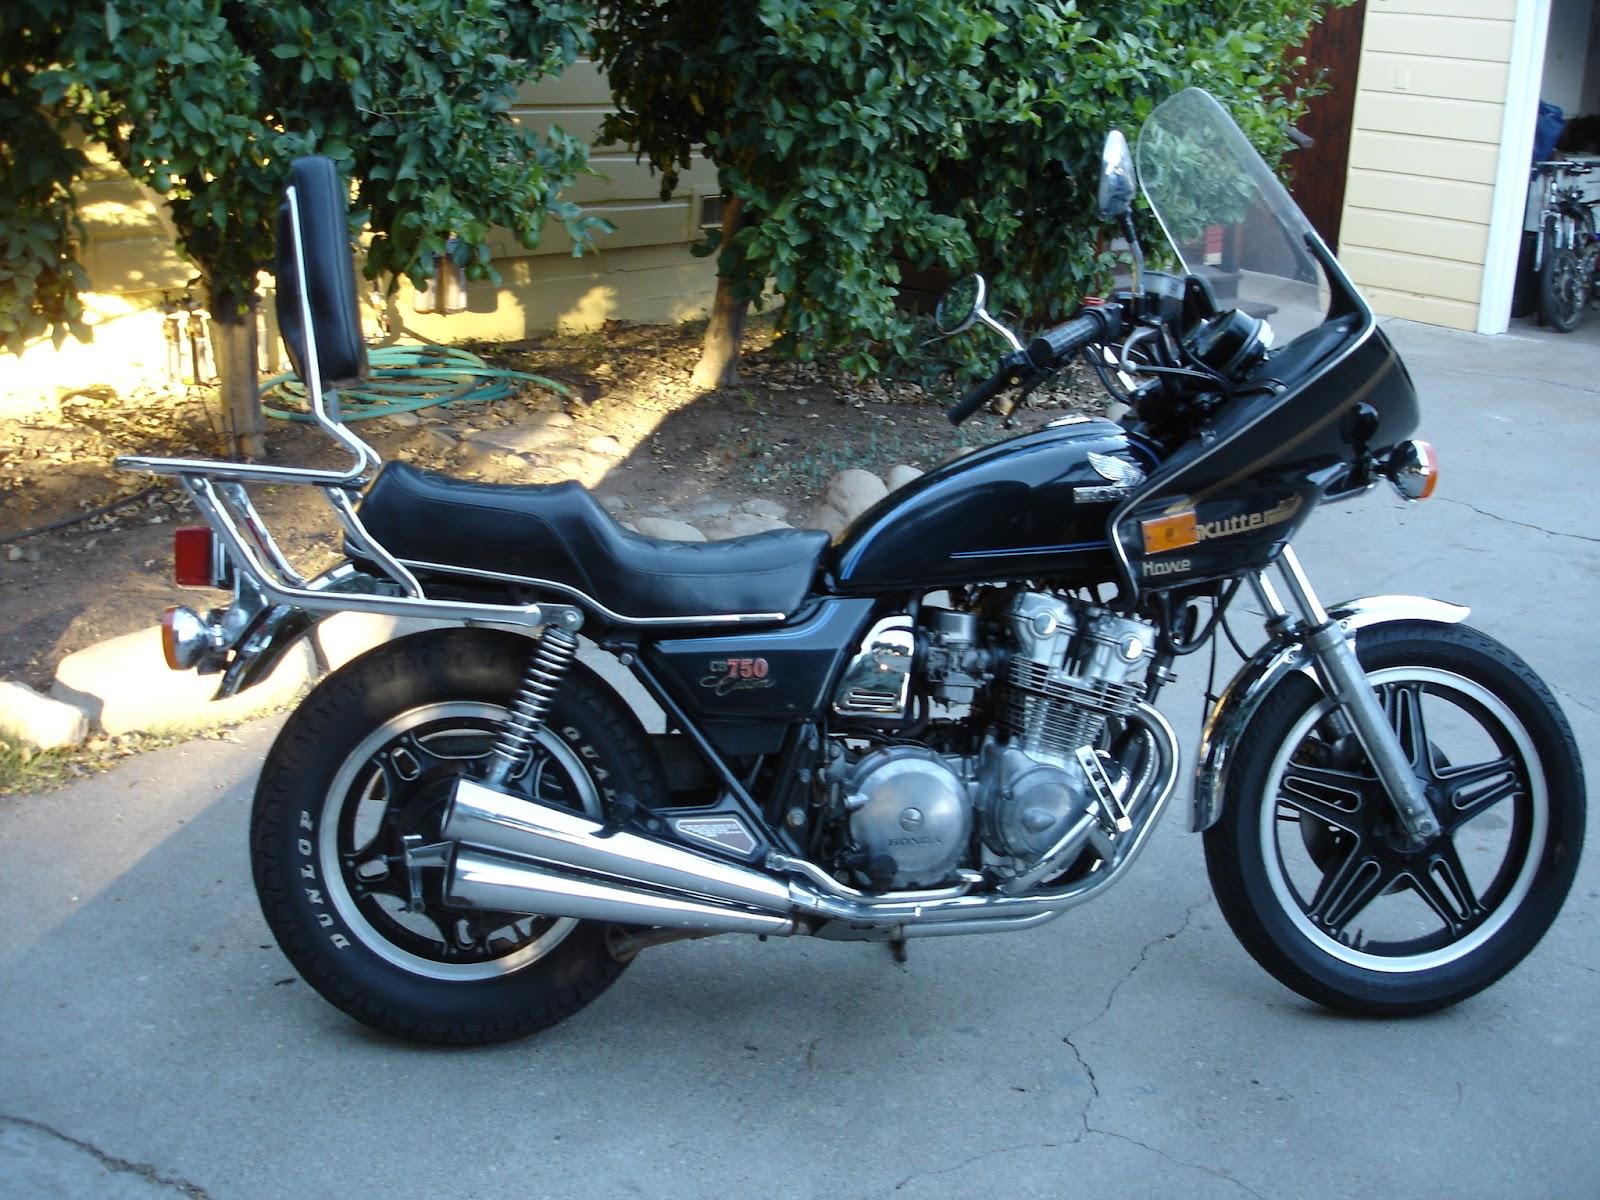 Milchapitas kustom bikes honda cb750 1980 by parker for 1980s honda motorcycles